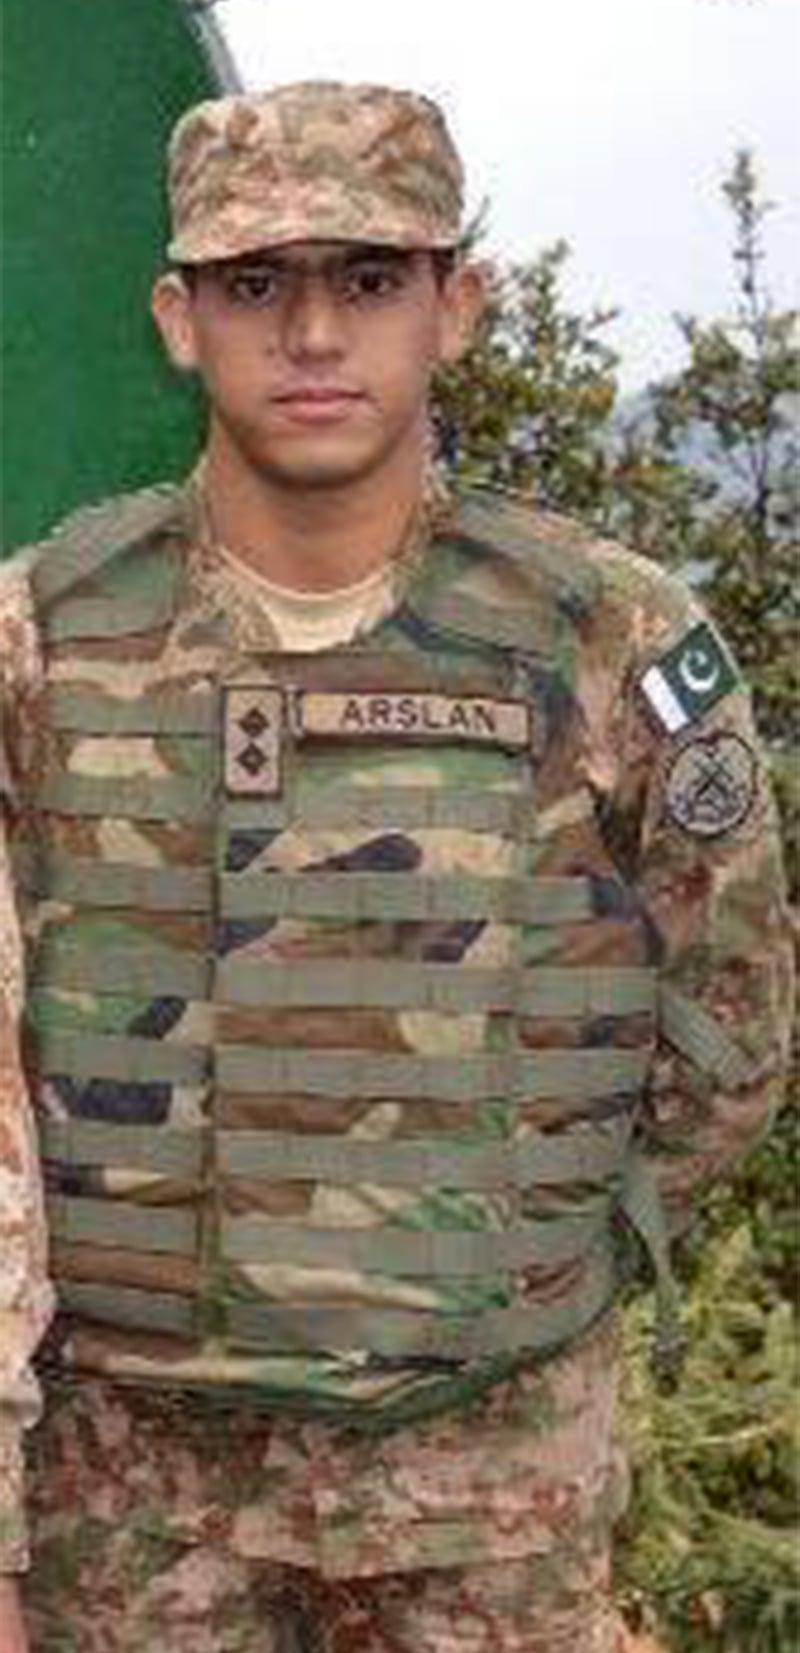 Lieutenant Arsalan Alam.